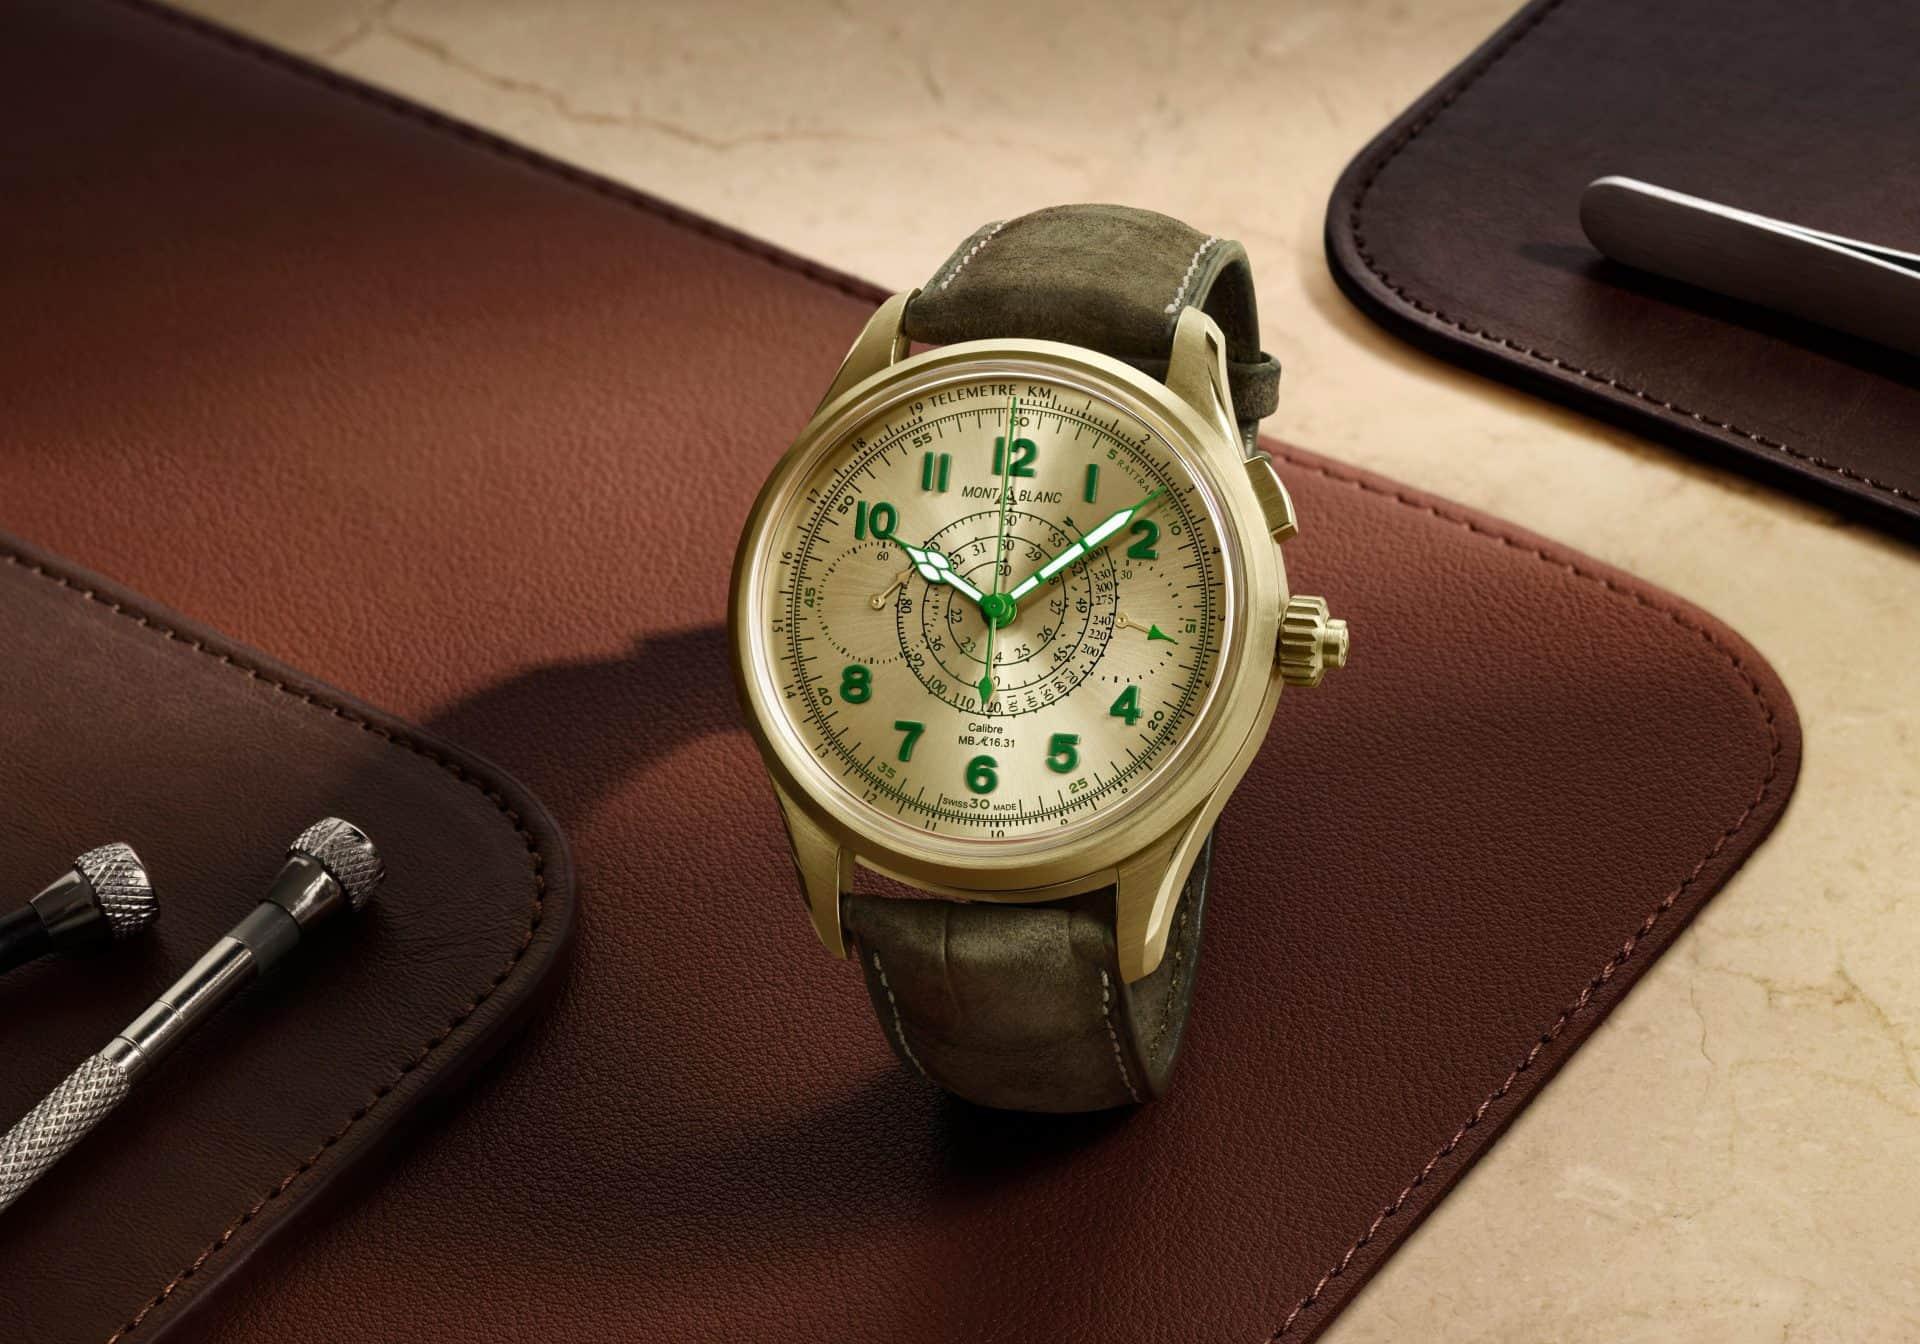 Leicht grüne Uhr Montblanc Split Second Chronograph Limited Edition